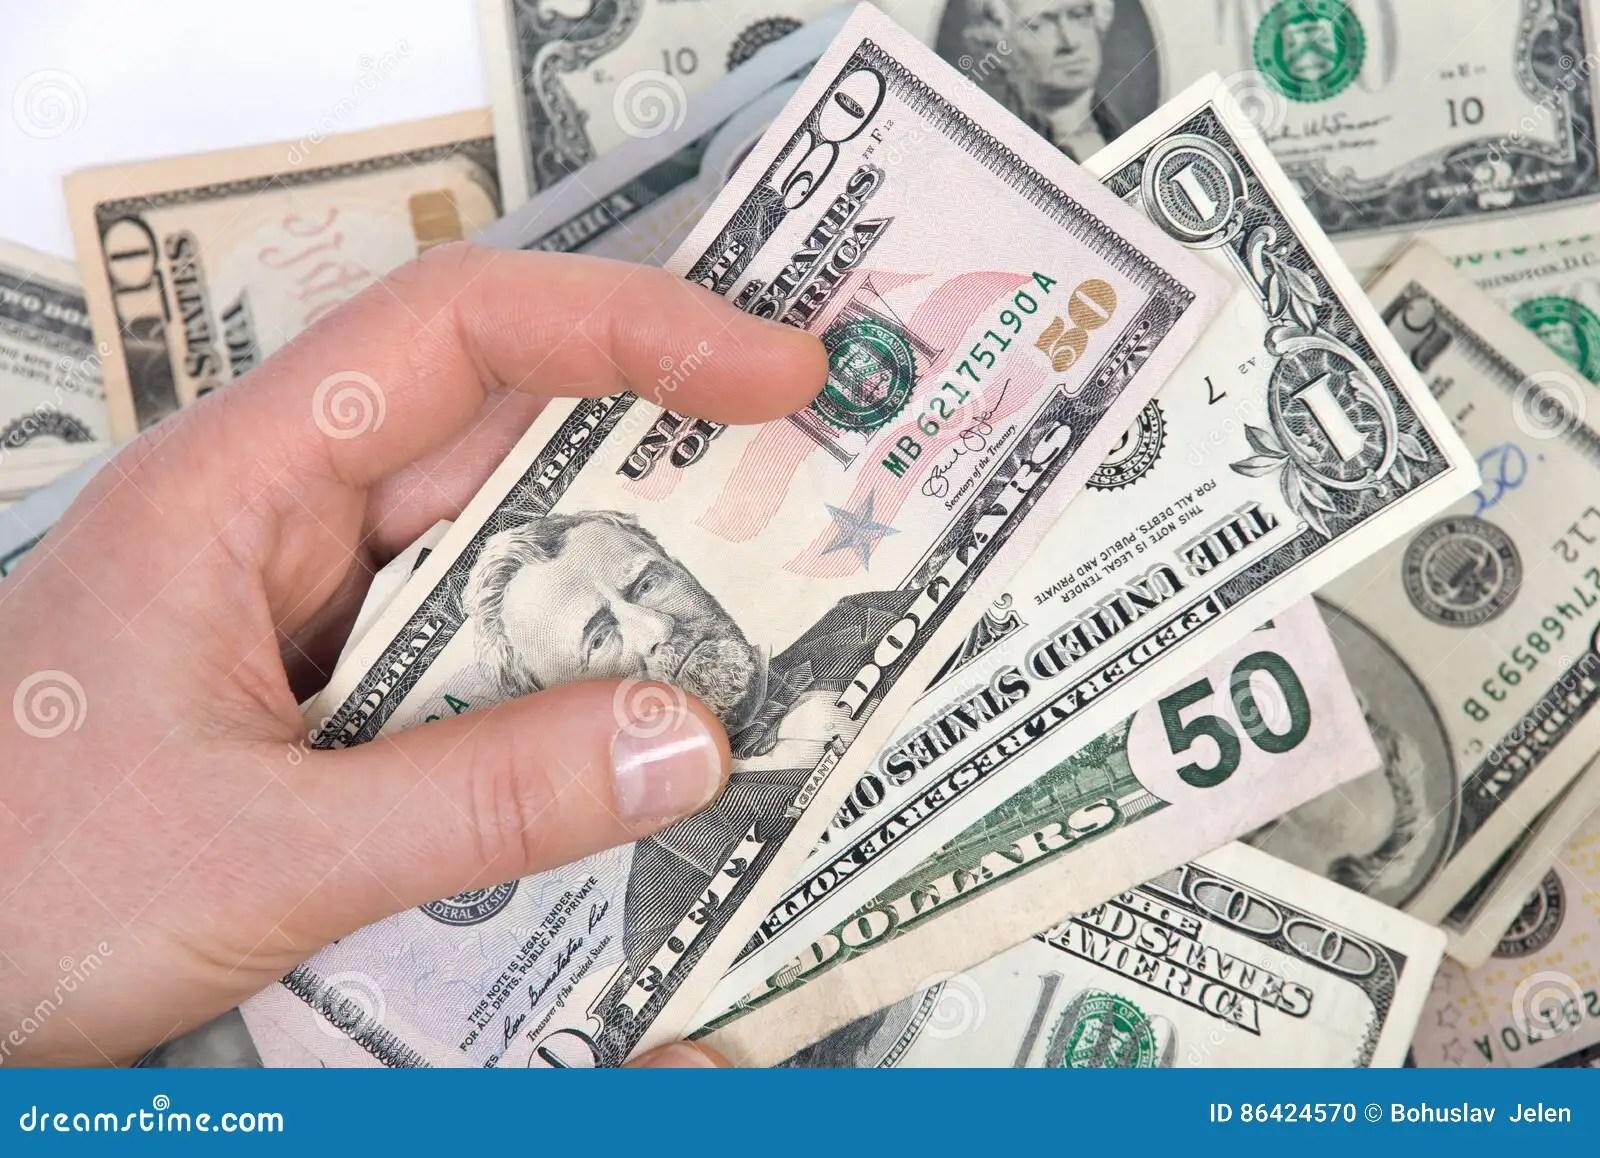 Human Hand Counting Us Dollar Bills Stock Photo